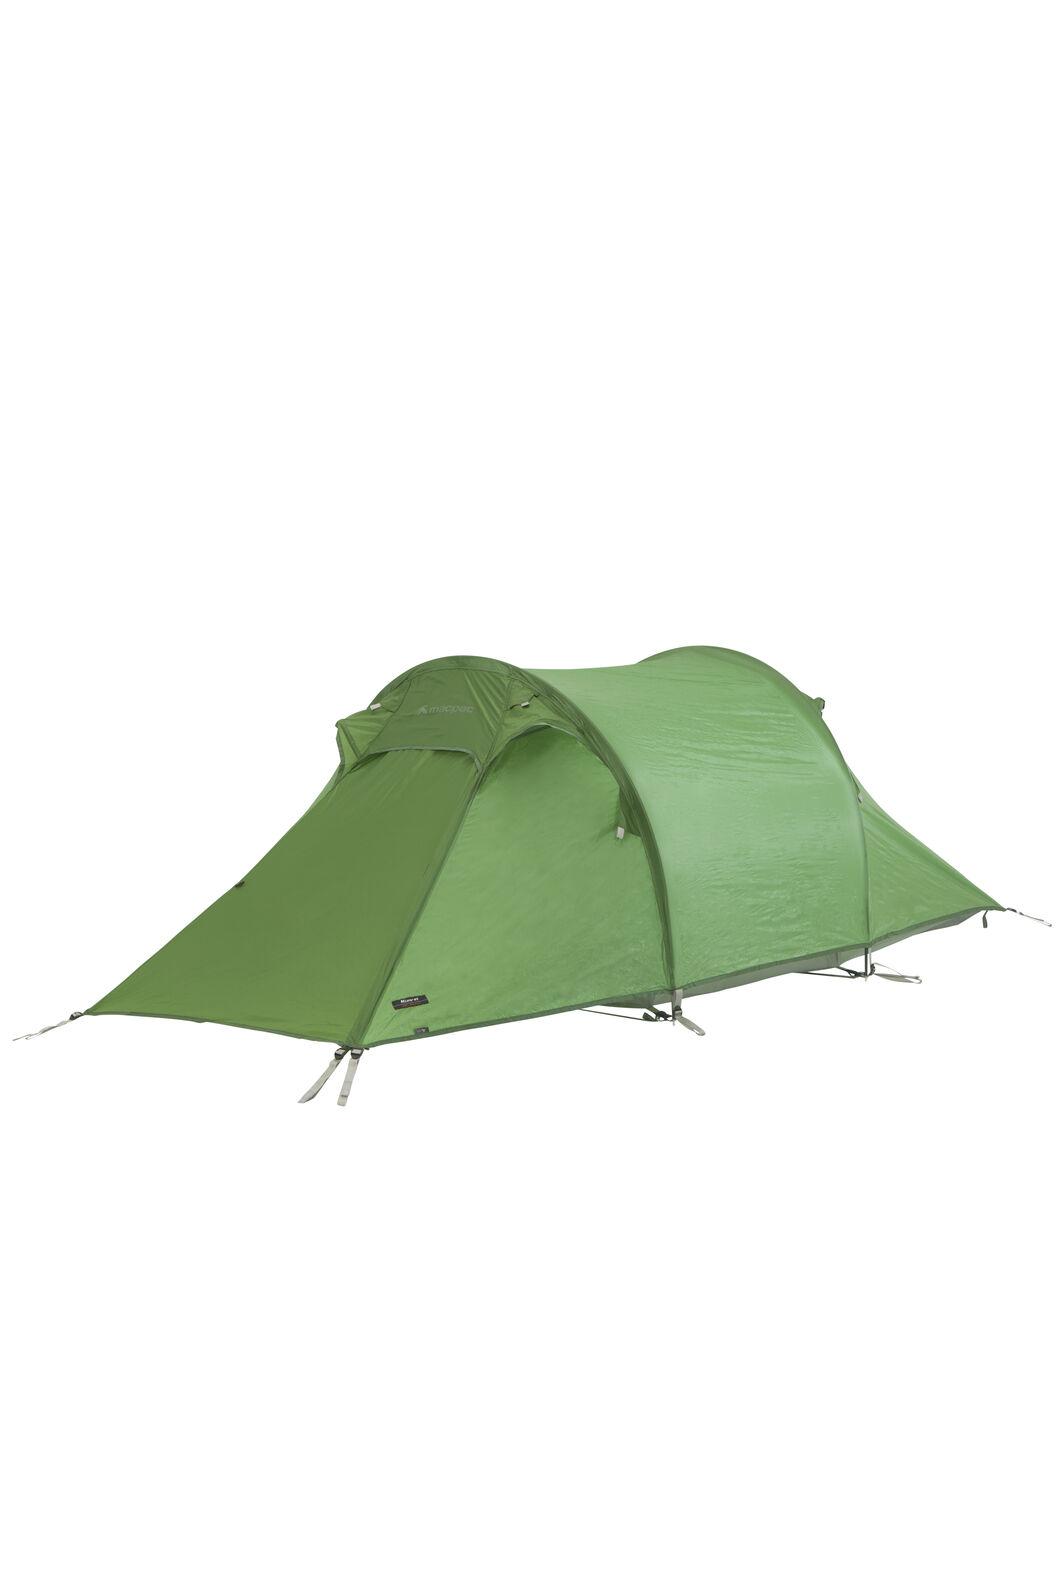 Macpac Minaret Hiking Tent, Kiwi, hi-res